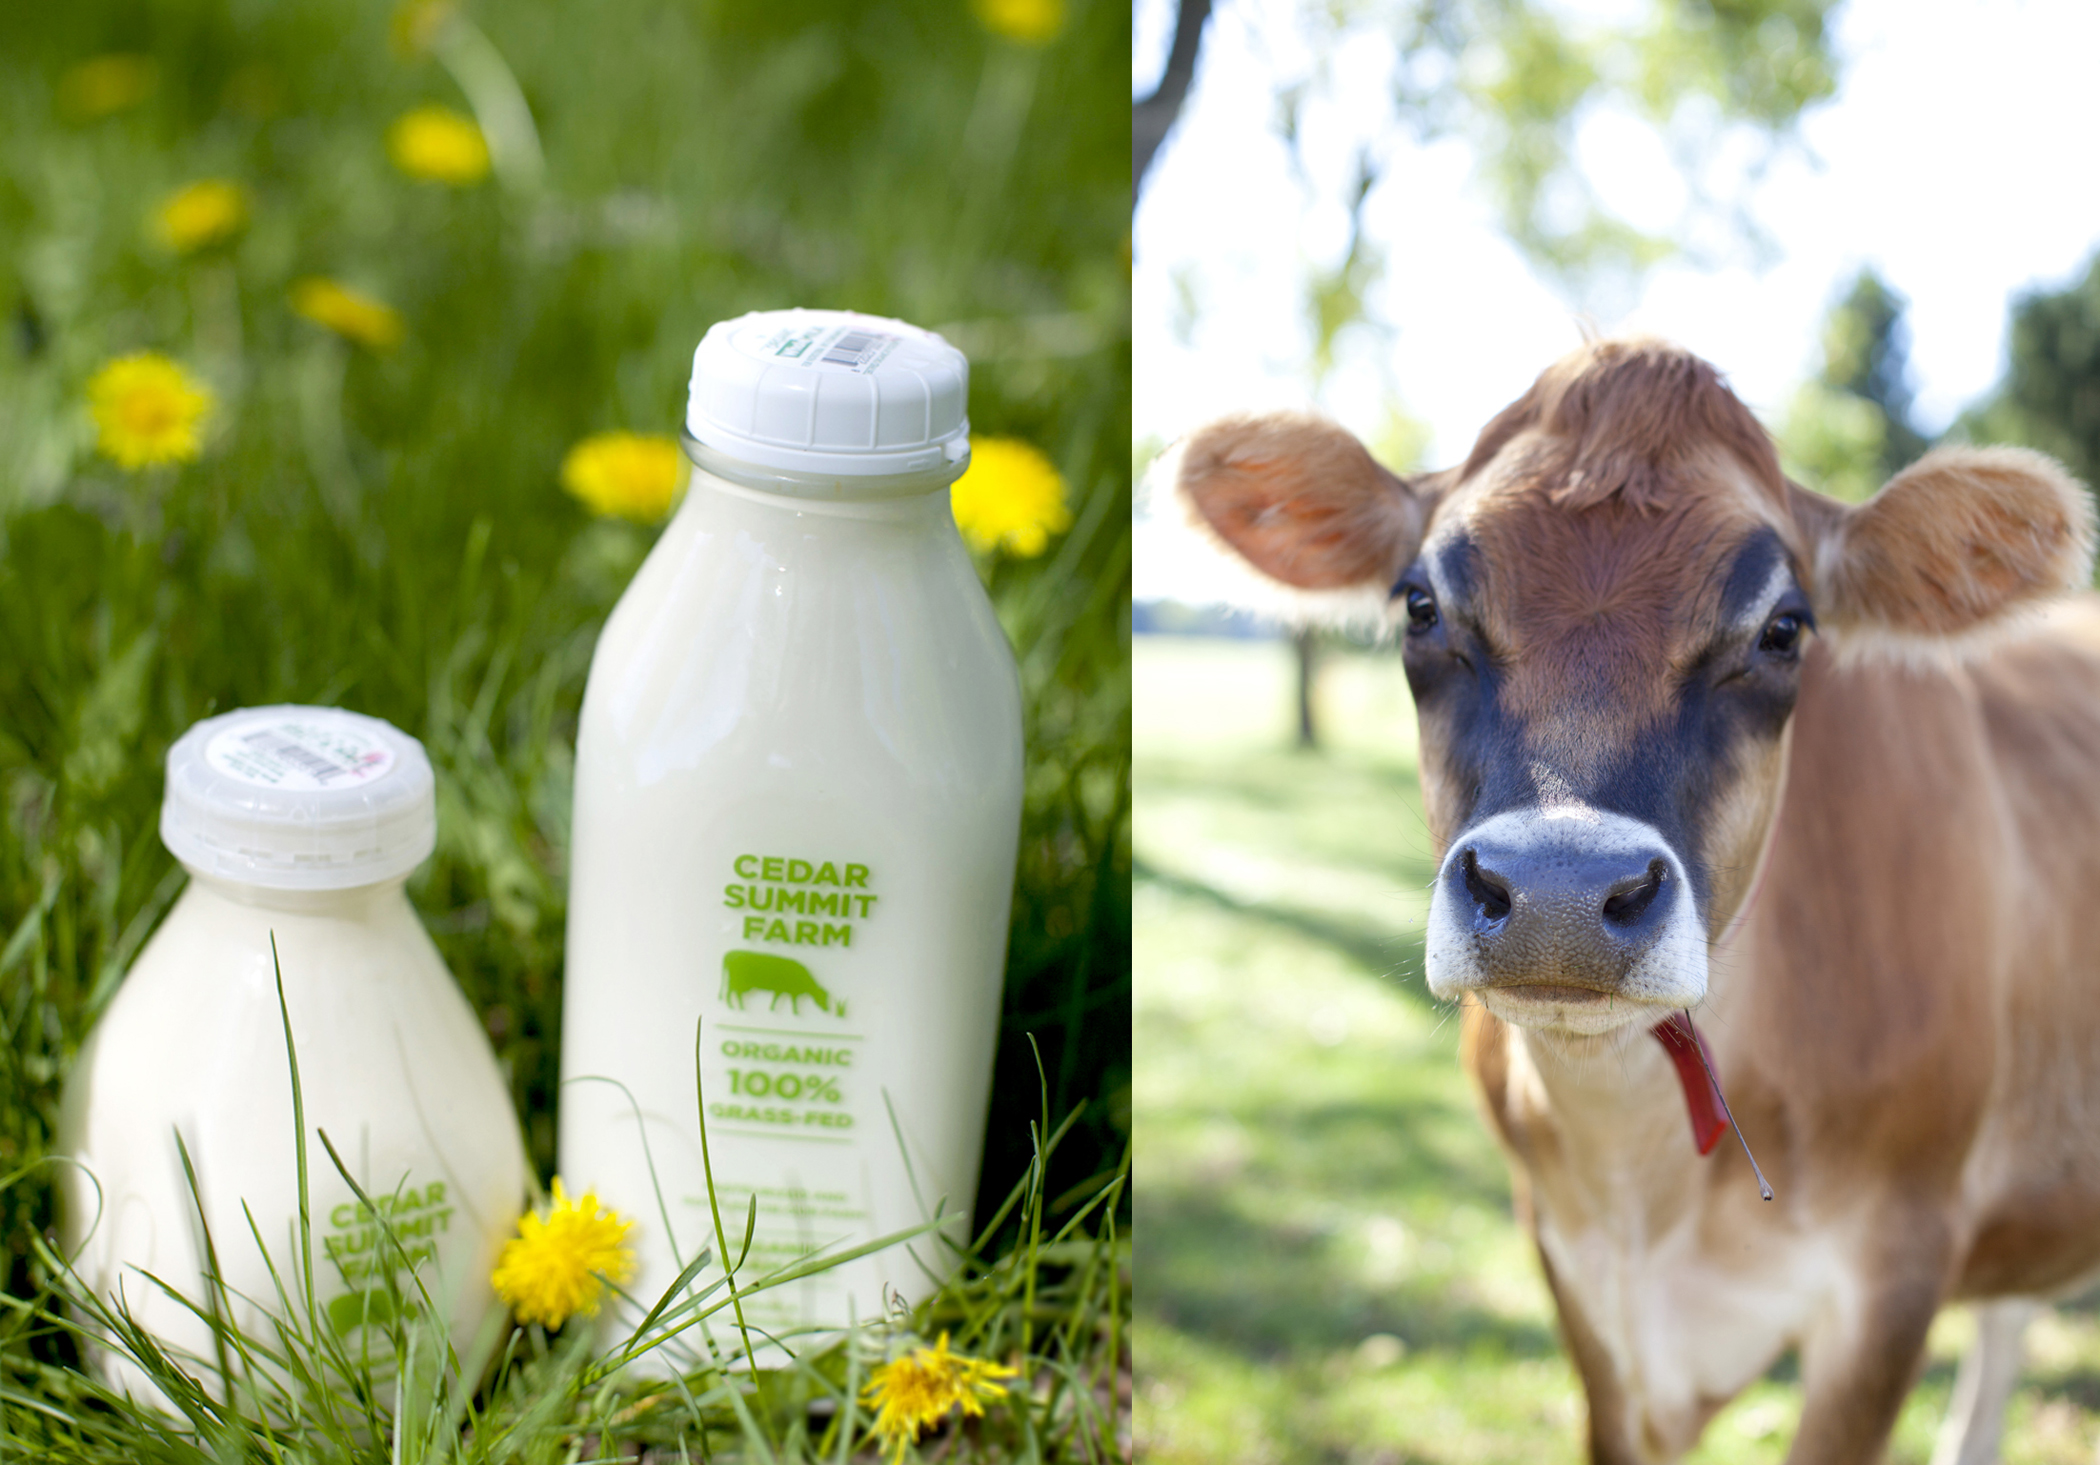 farm photography organic cow and milk